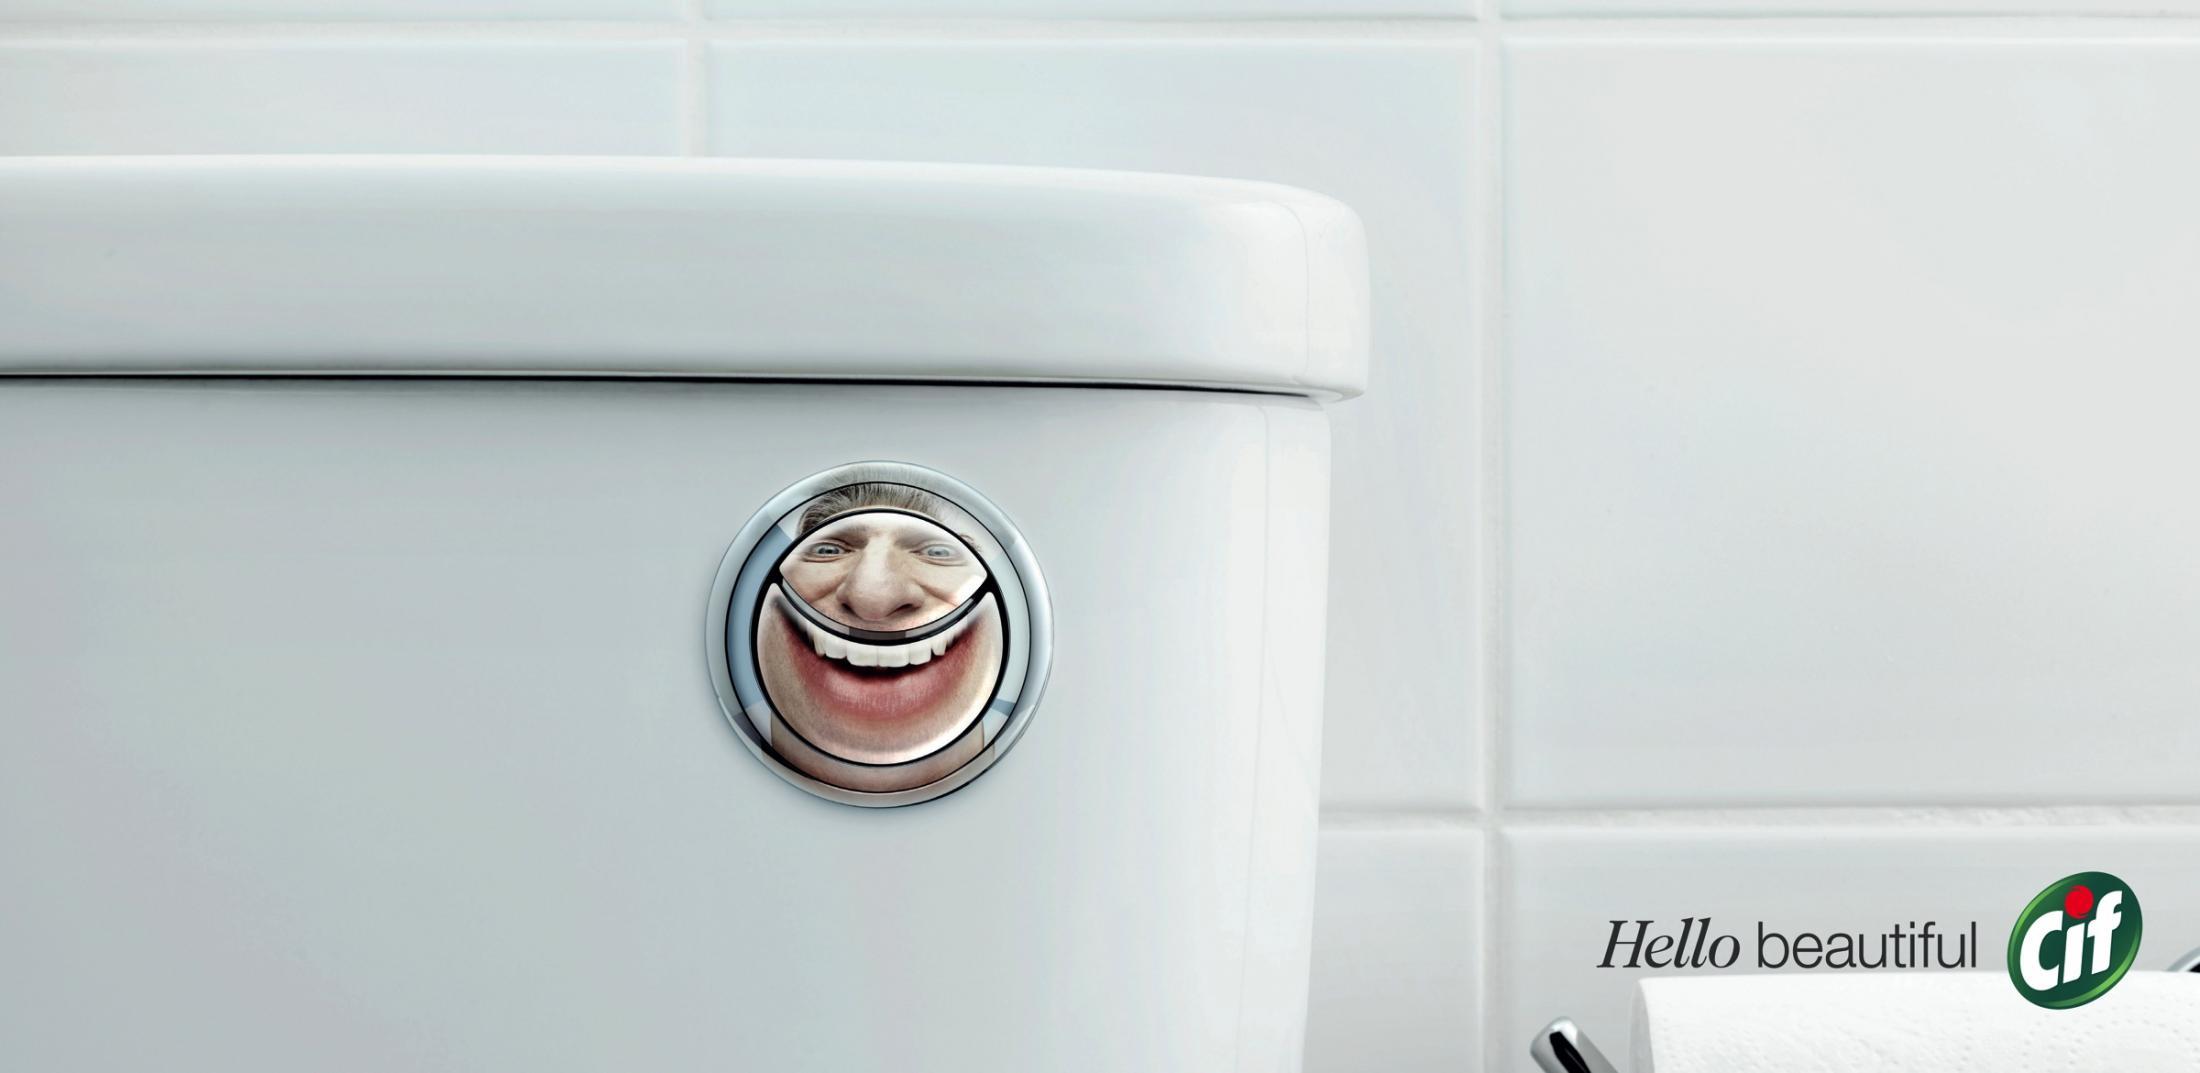 Cif Print Ad - Hello Beautiful, 1